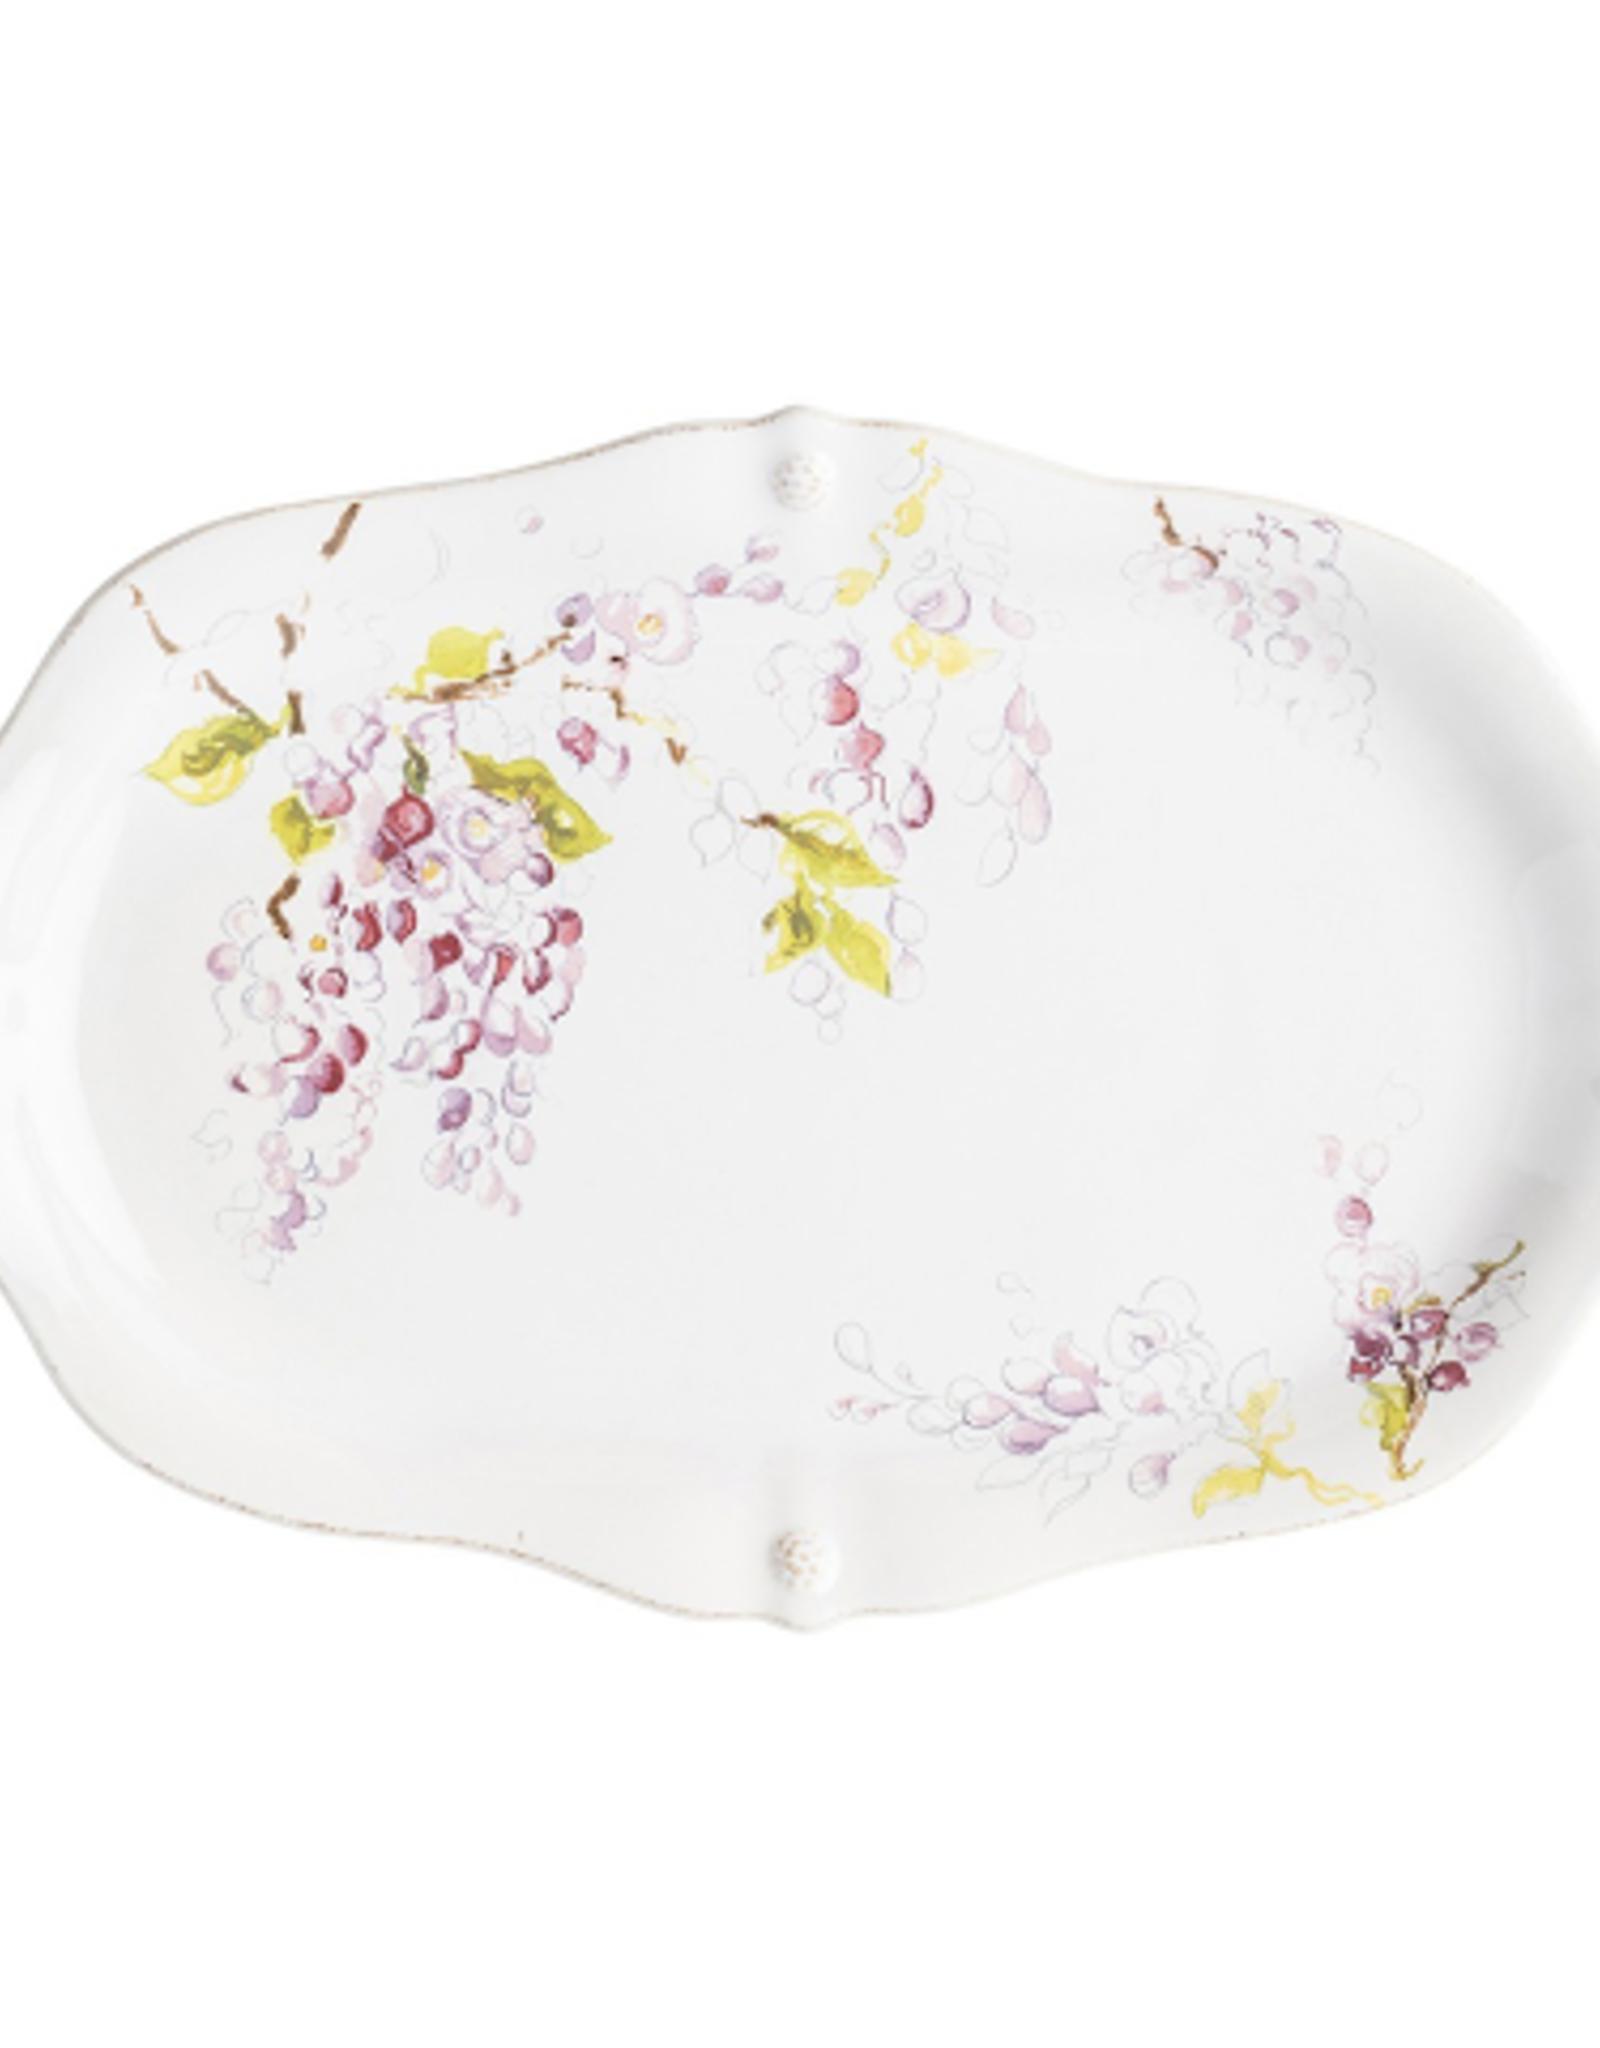 "Juliska Berry & Thread Floral Sketch Wisteria 16"" Platter"